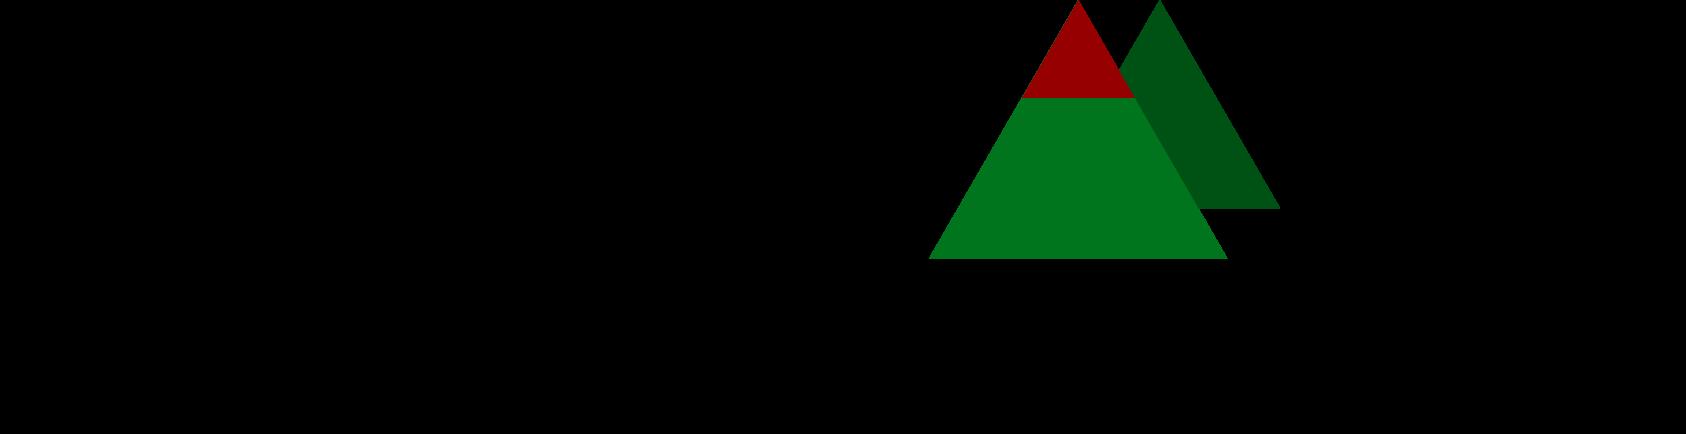 Vogelsberg.wiki